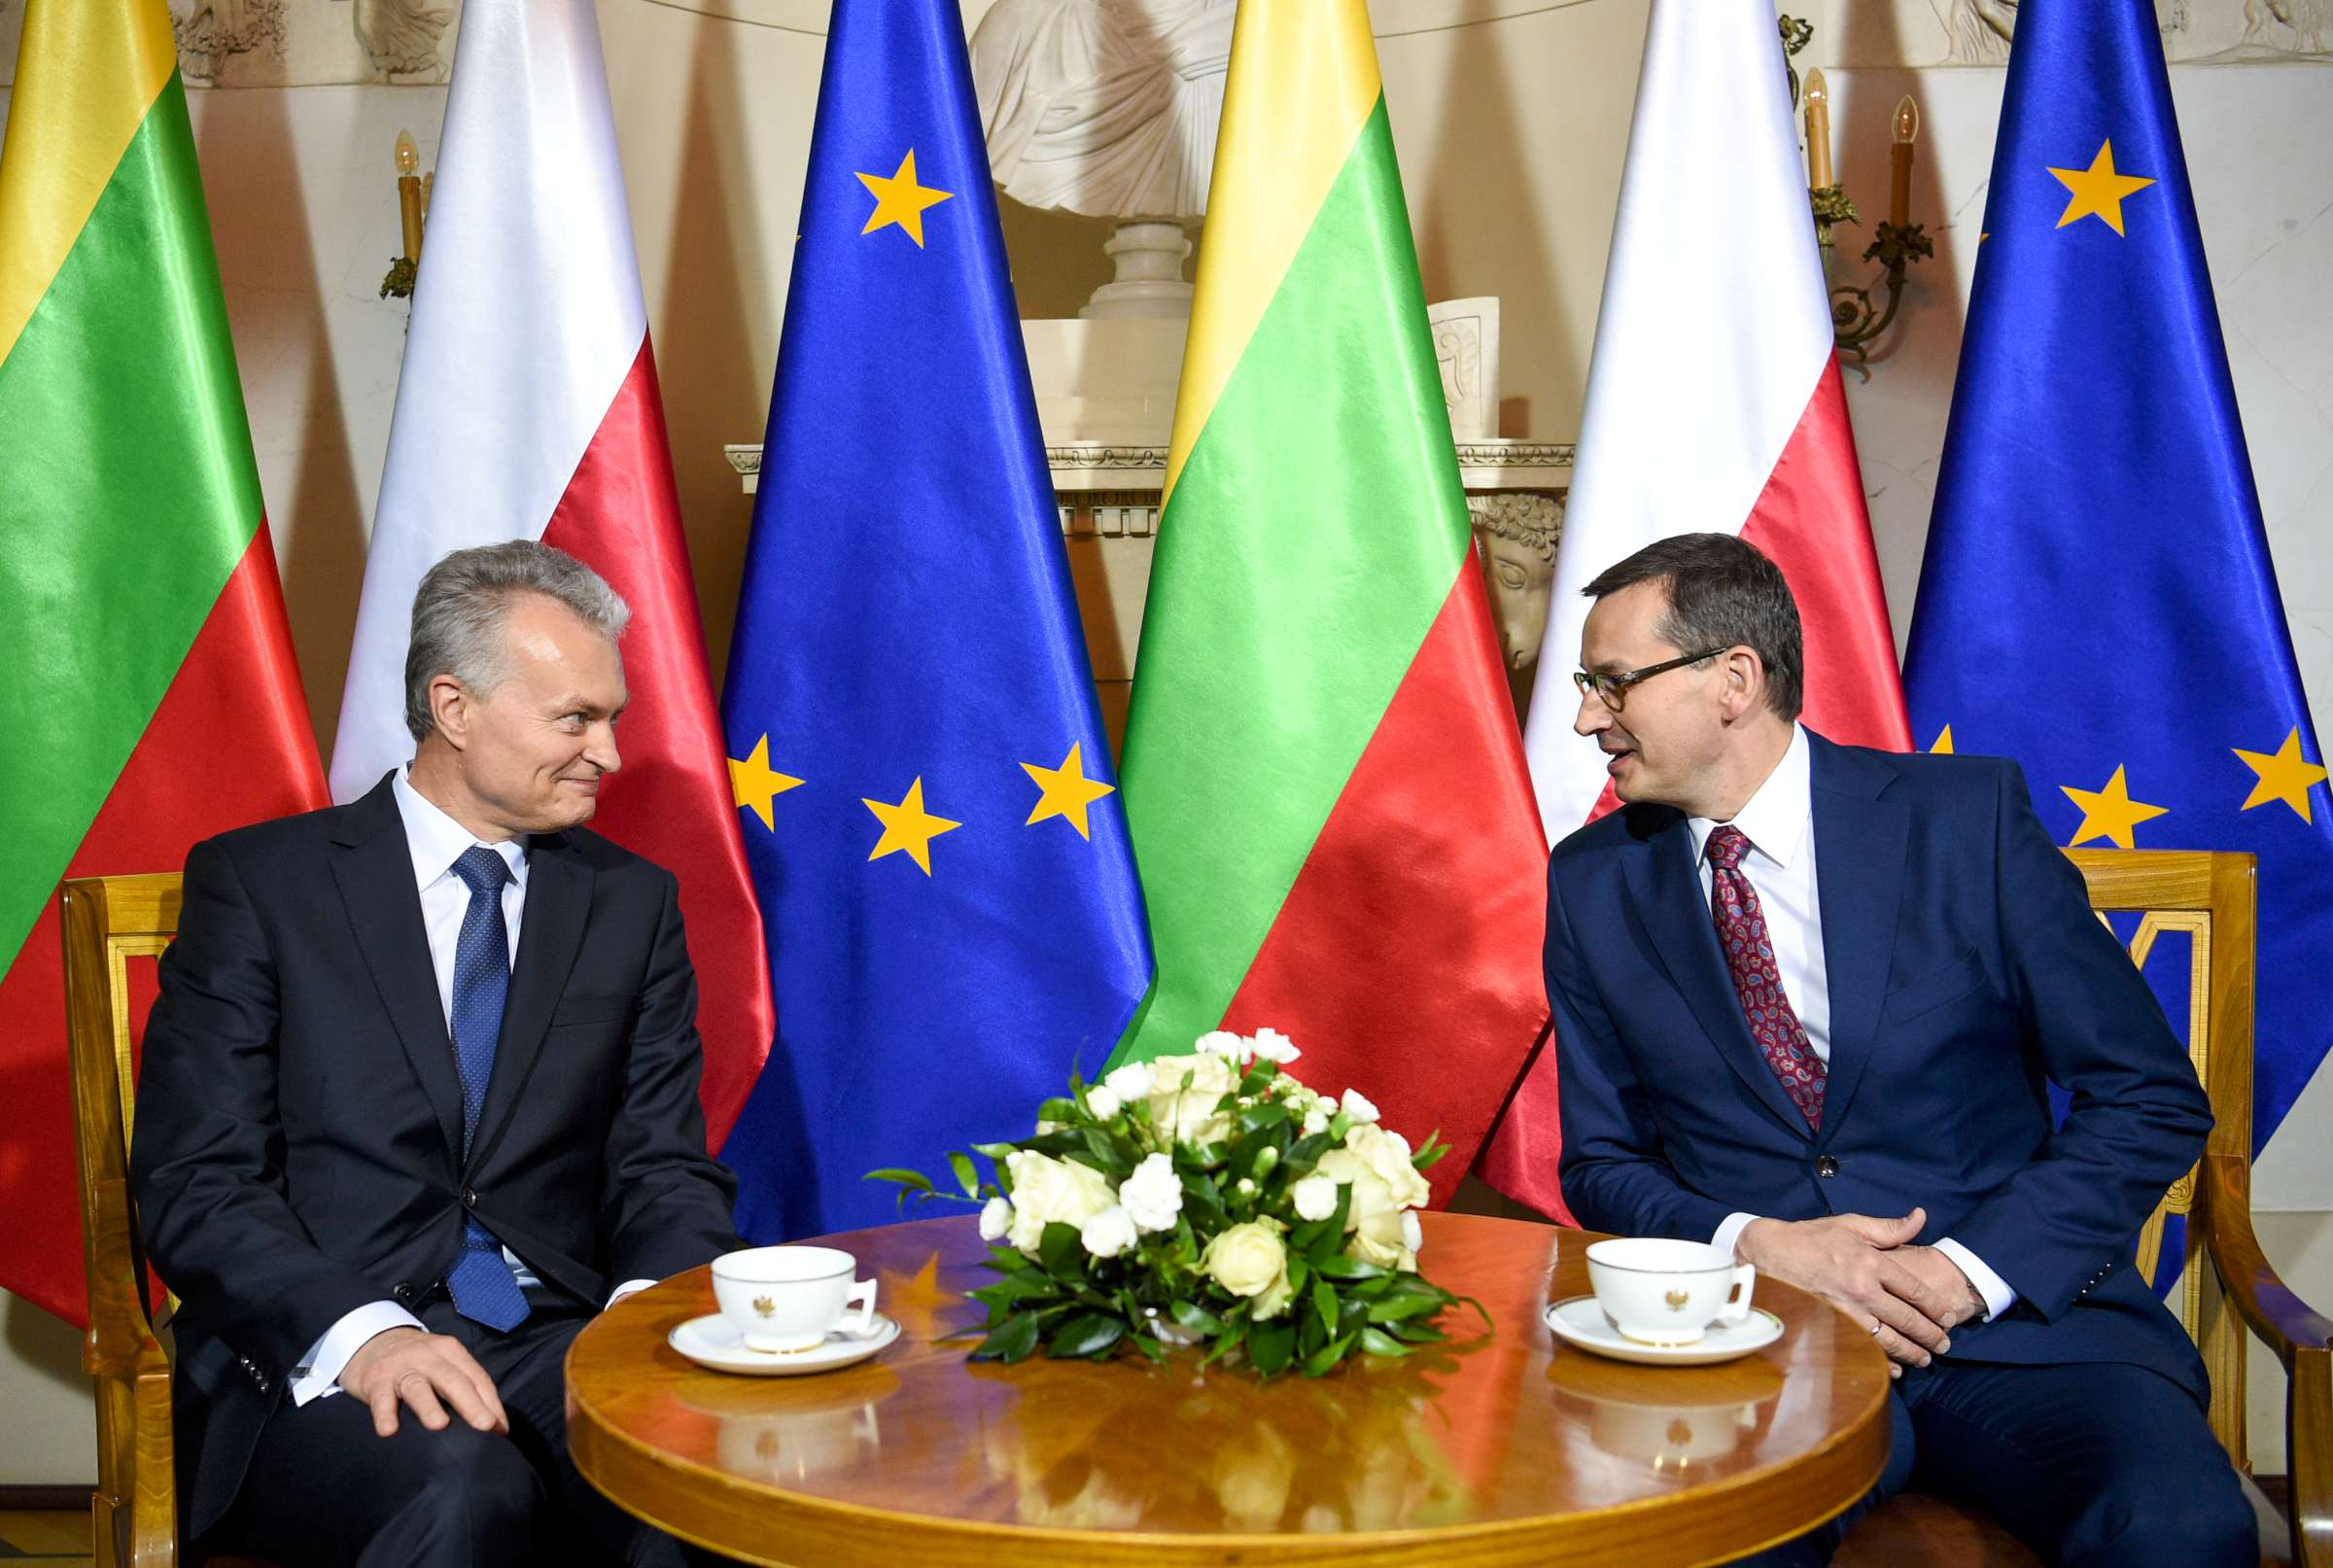 Lietuvos prezidentas Gitanas Nausėda su Lenkijos Seimo Pirmininku Mareku Kuchčinskiu | lrp.lt, R. Dačkaus nuotr.